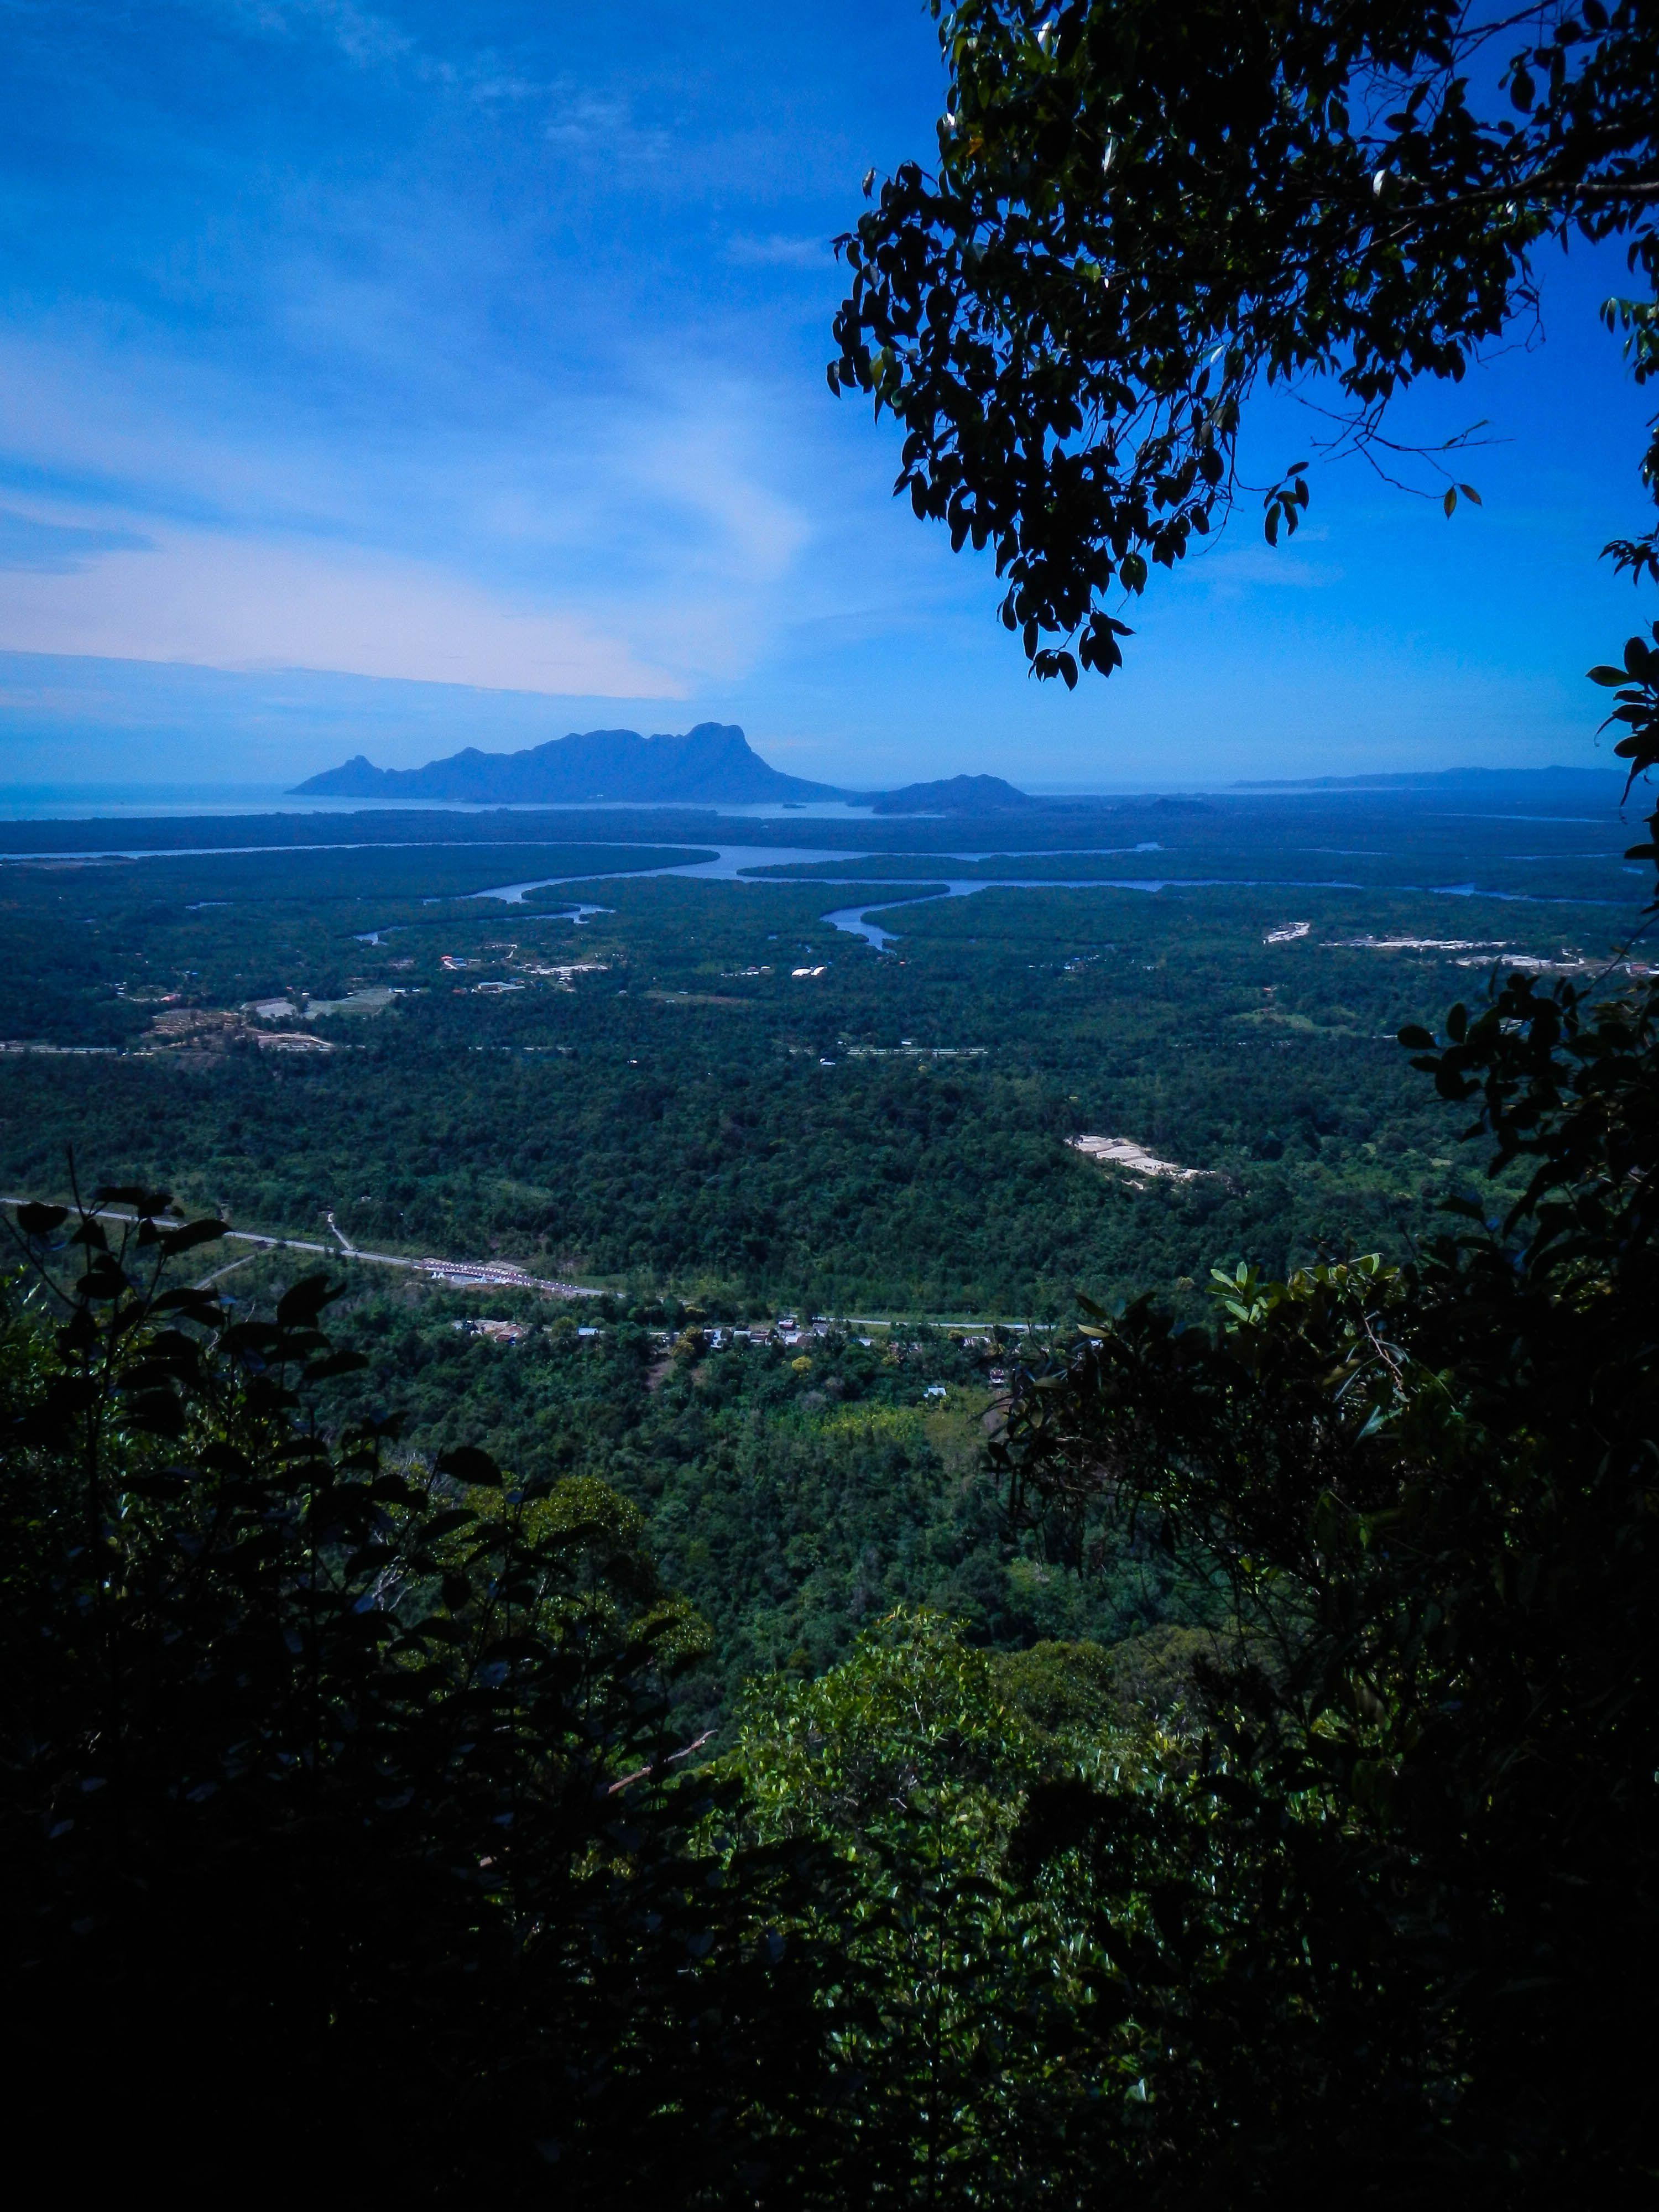 Kubah National Park Viewpoint Http Www Inspirawtion Com Kubah National Park Html Borneo Travel National Parks Trip